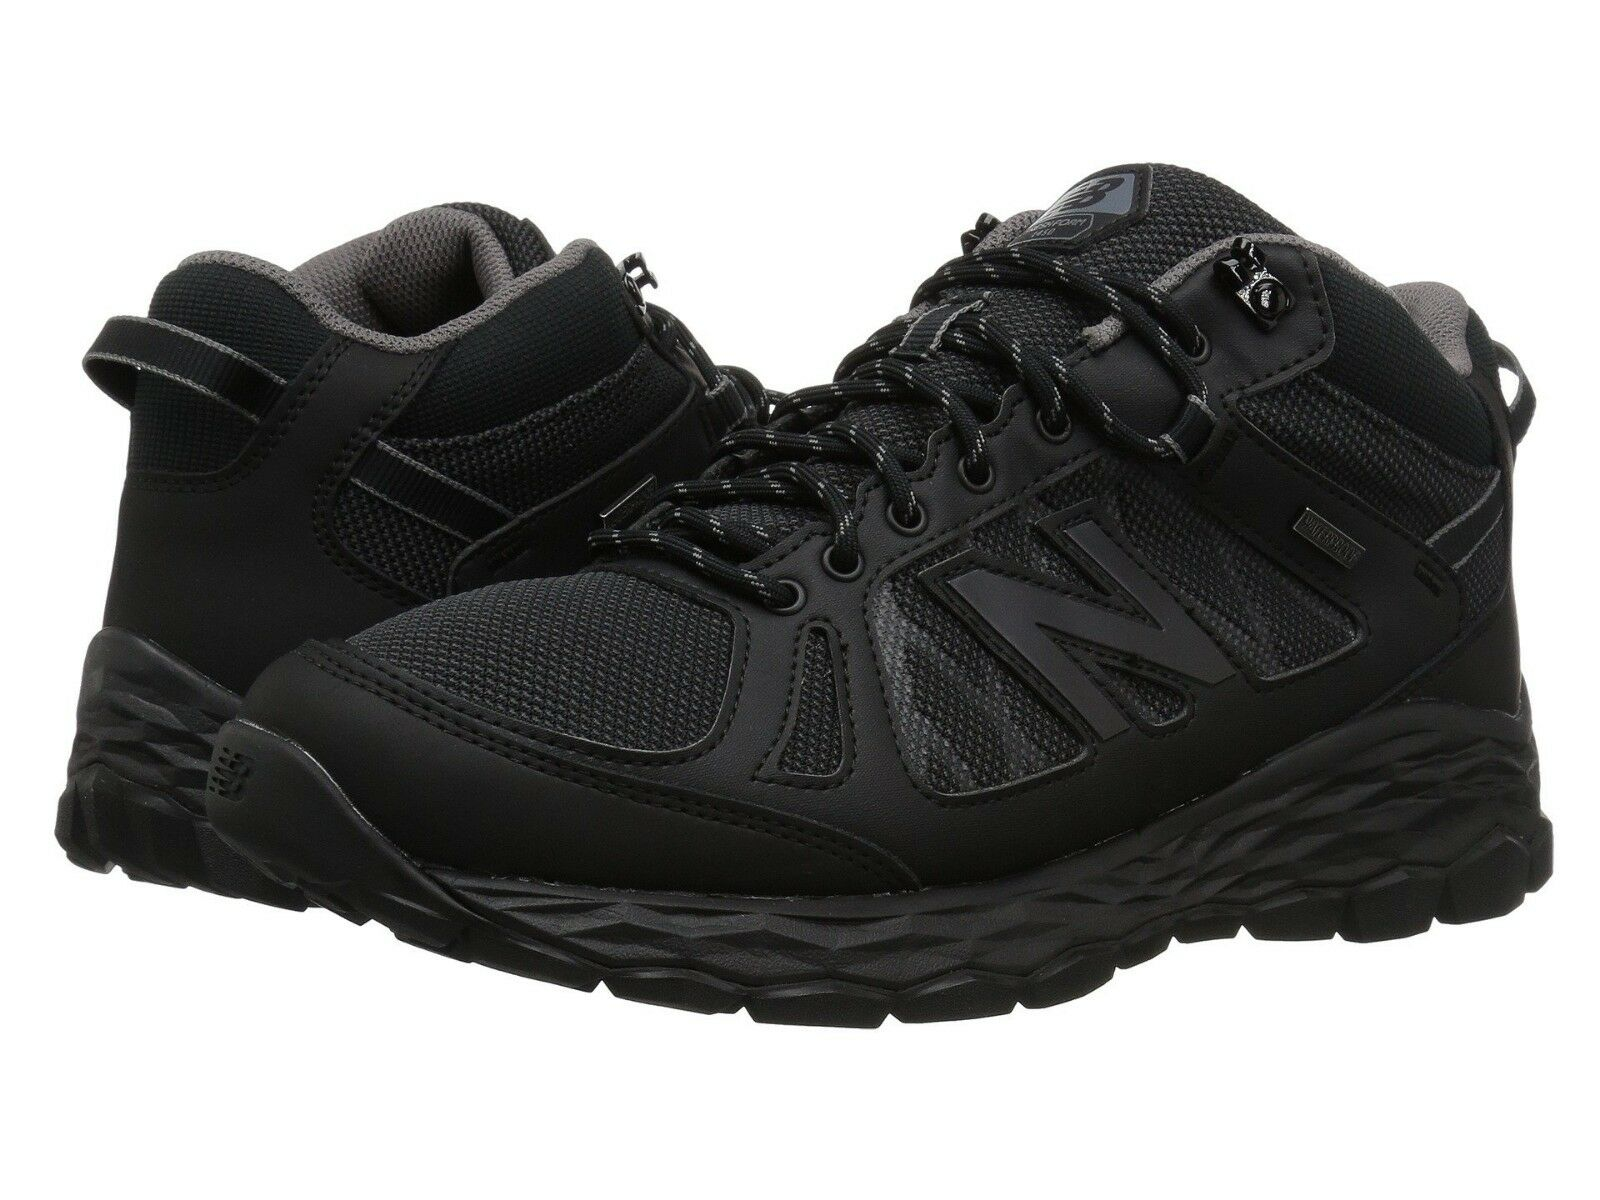 NEW Mens New Balance 1450W Fresh Foam Black Grey Waterproof Hiking shoes GENUINE